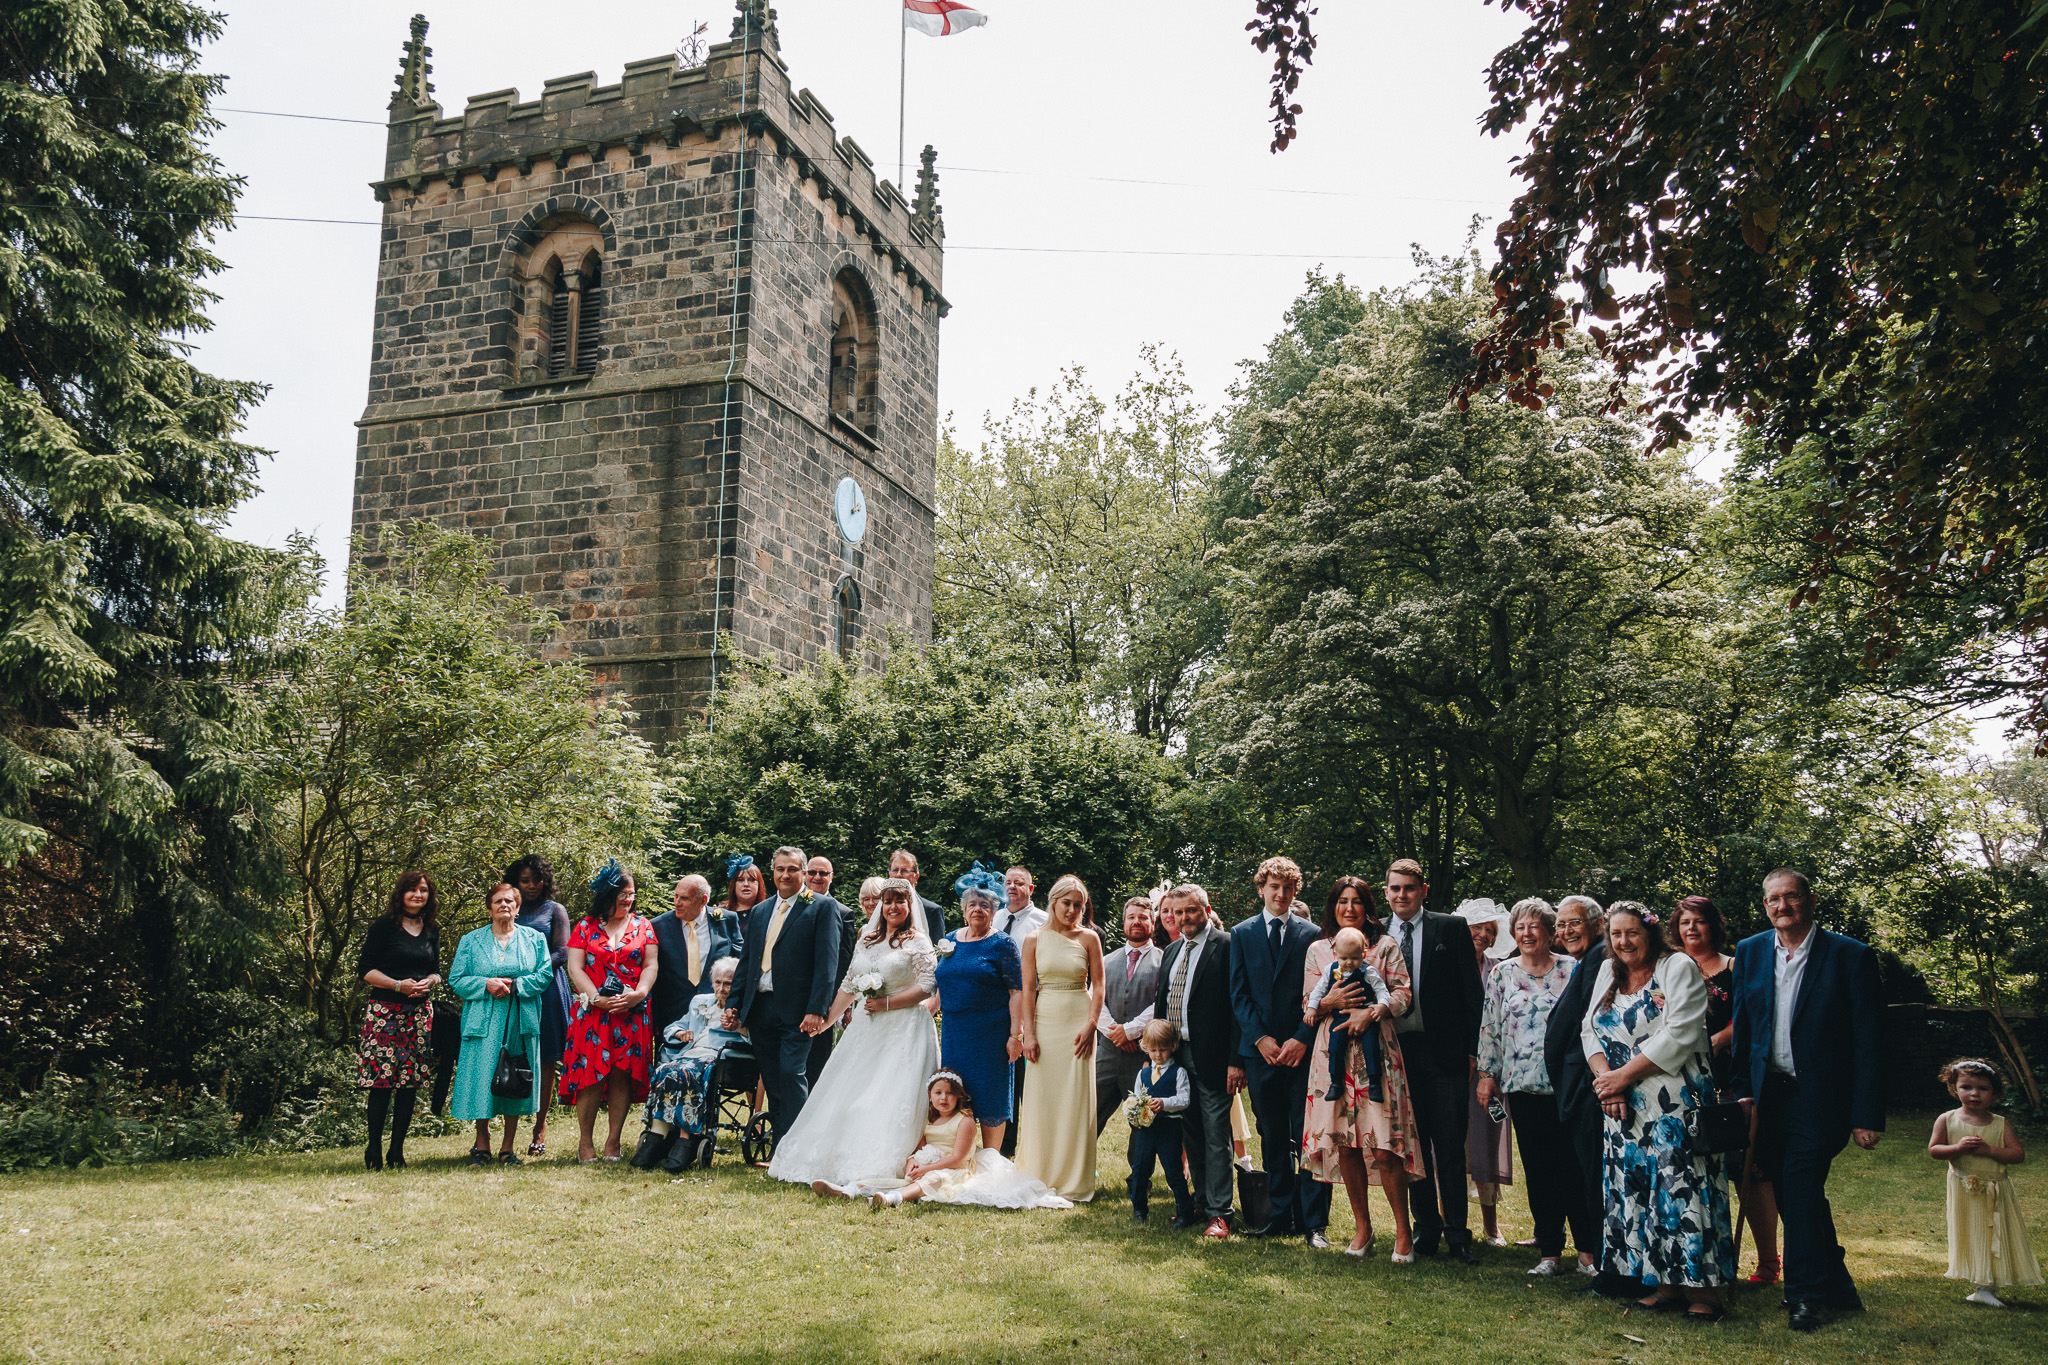 Nat and Sergio Wedding Photos - Website Quality_131.jpg